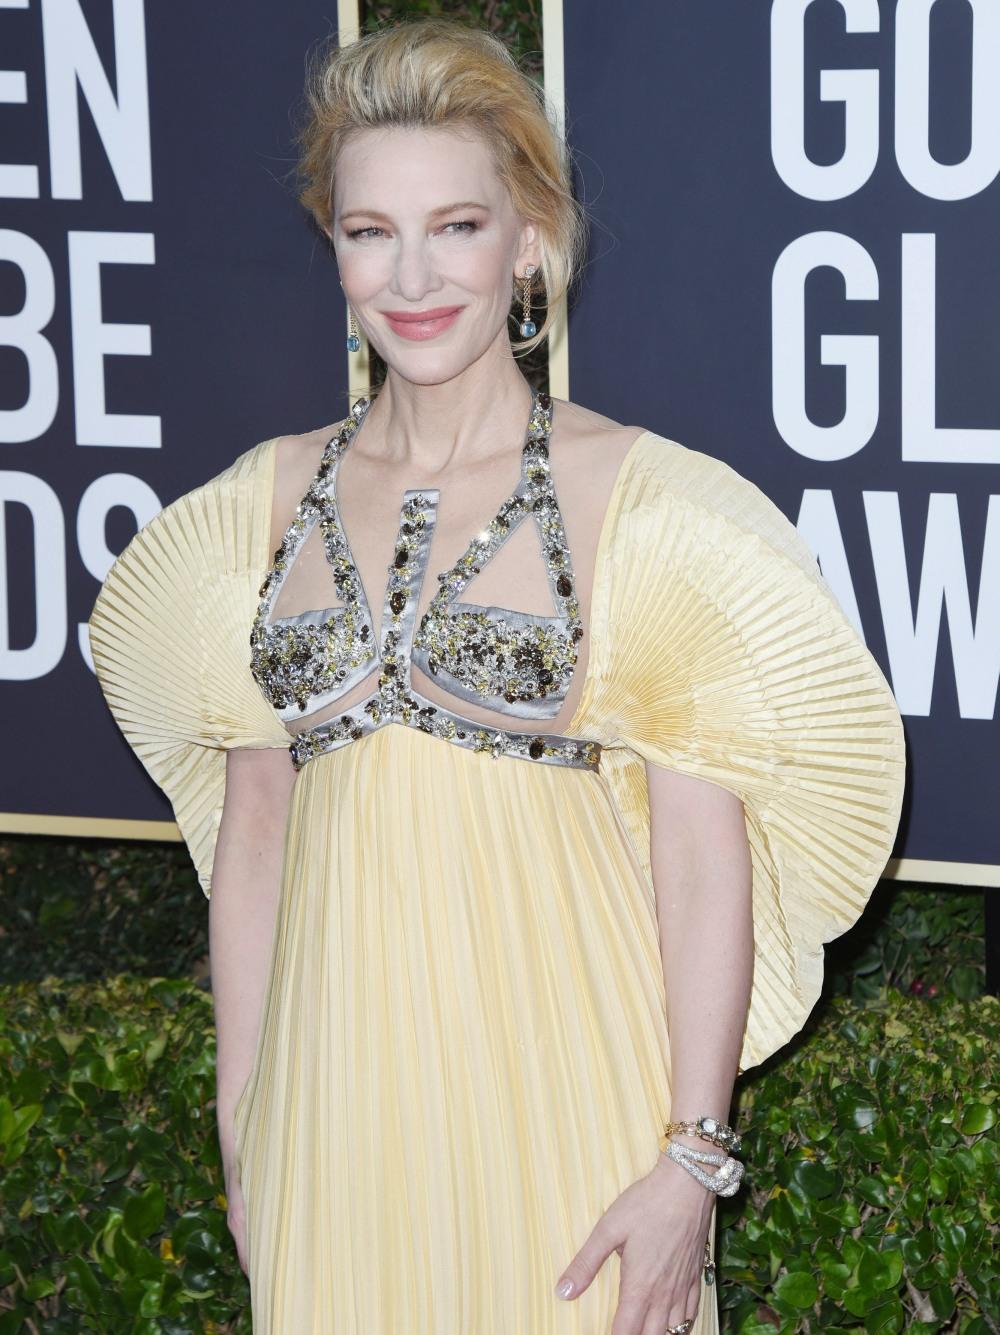 Cate Blanchett attends the 77th Annual Golden Globe Awards at The Beverly Hilton Hotel on January 05, 2020 in Beverly Hills, California © Jill Johnson/jpistudios.com